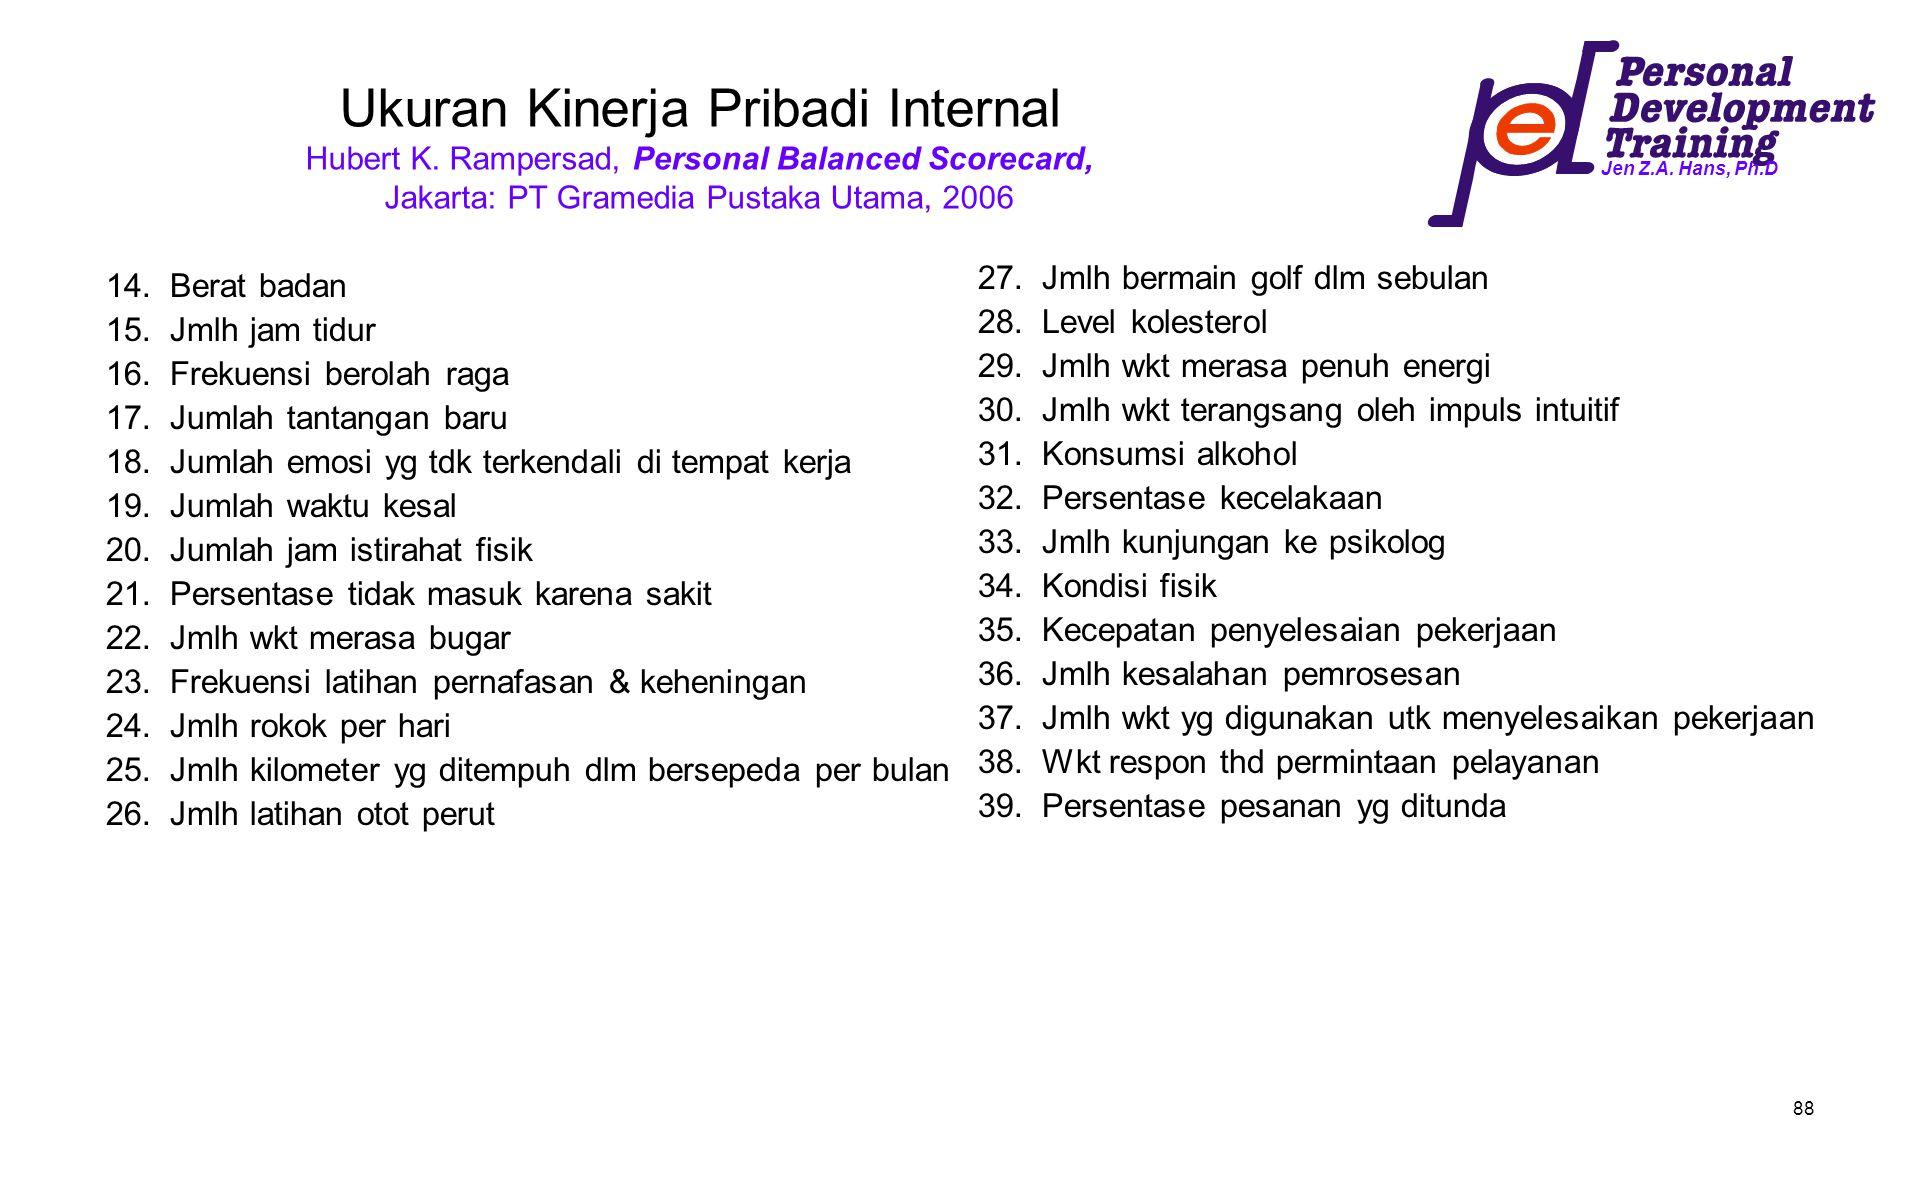 Jen Z.A. Hans, Ph.D 88 Ukuran Kinerja Pribadi Internal Hubert K. Rampersad, Personal Balanced Scorecard, Jakarta: PT Gramedia Pustaka Utama, 2006 14.B